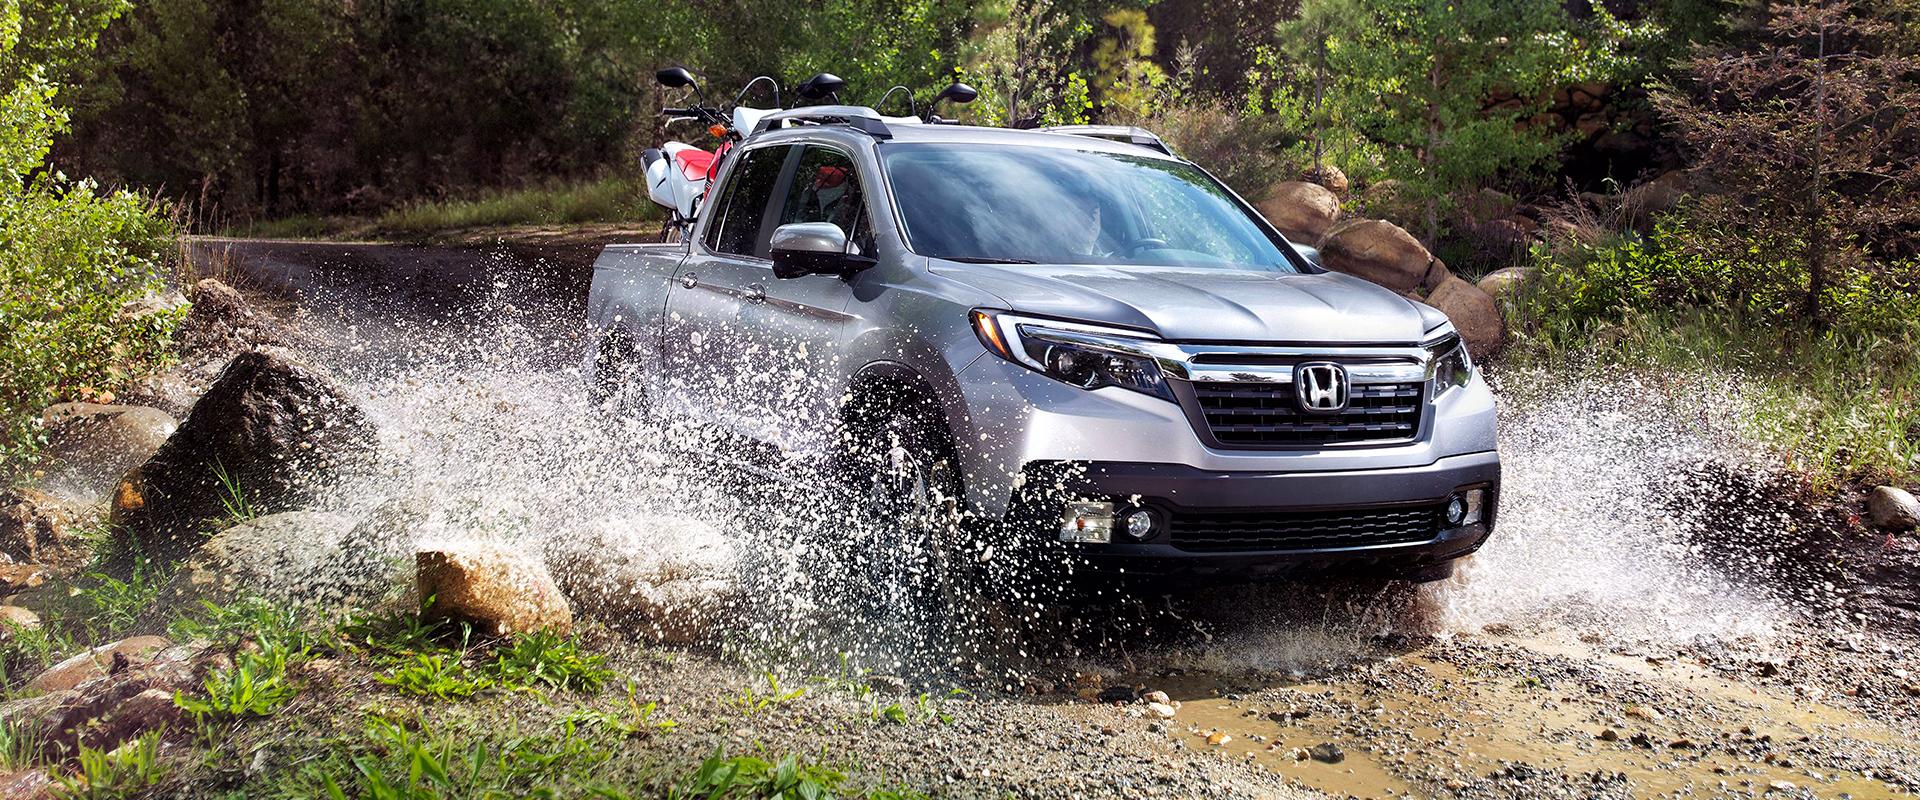 Honda Dealerships In Alabama >> 2019 Honda Ridgeline Central Alabama Honda Dealers